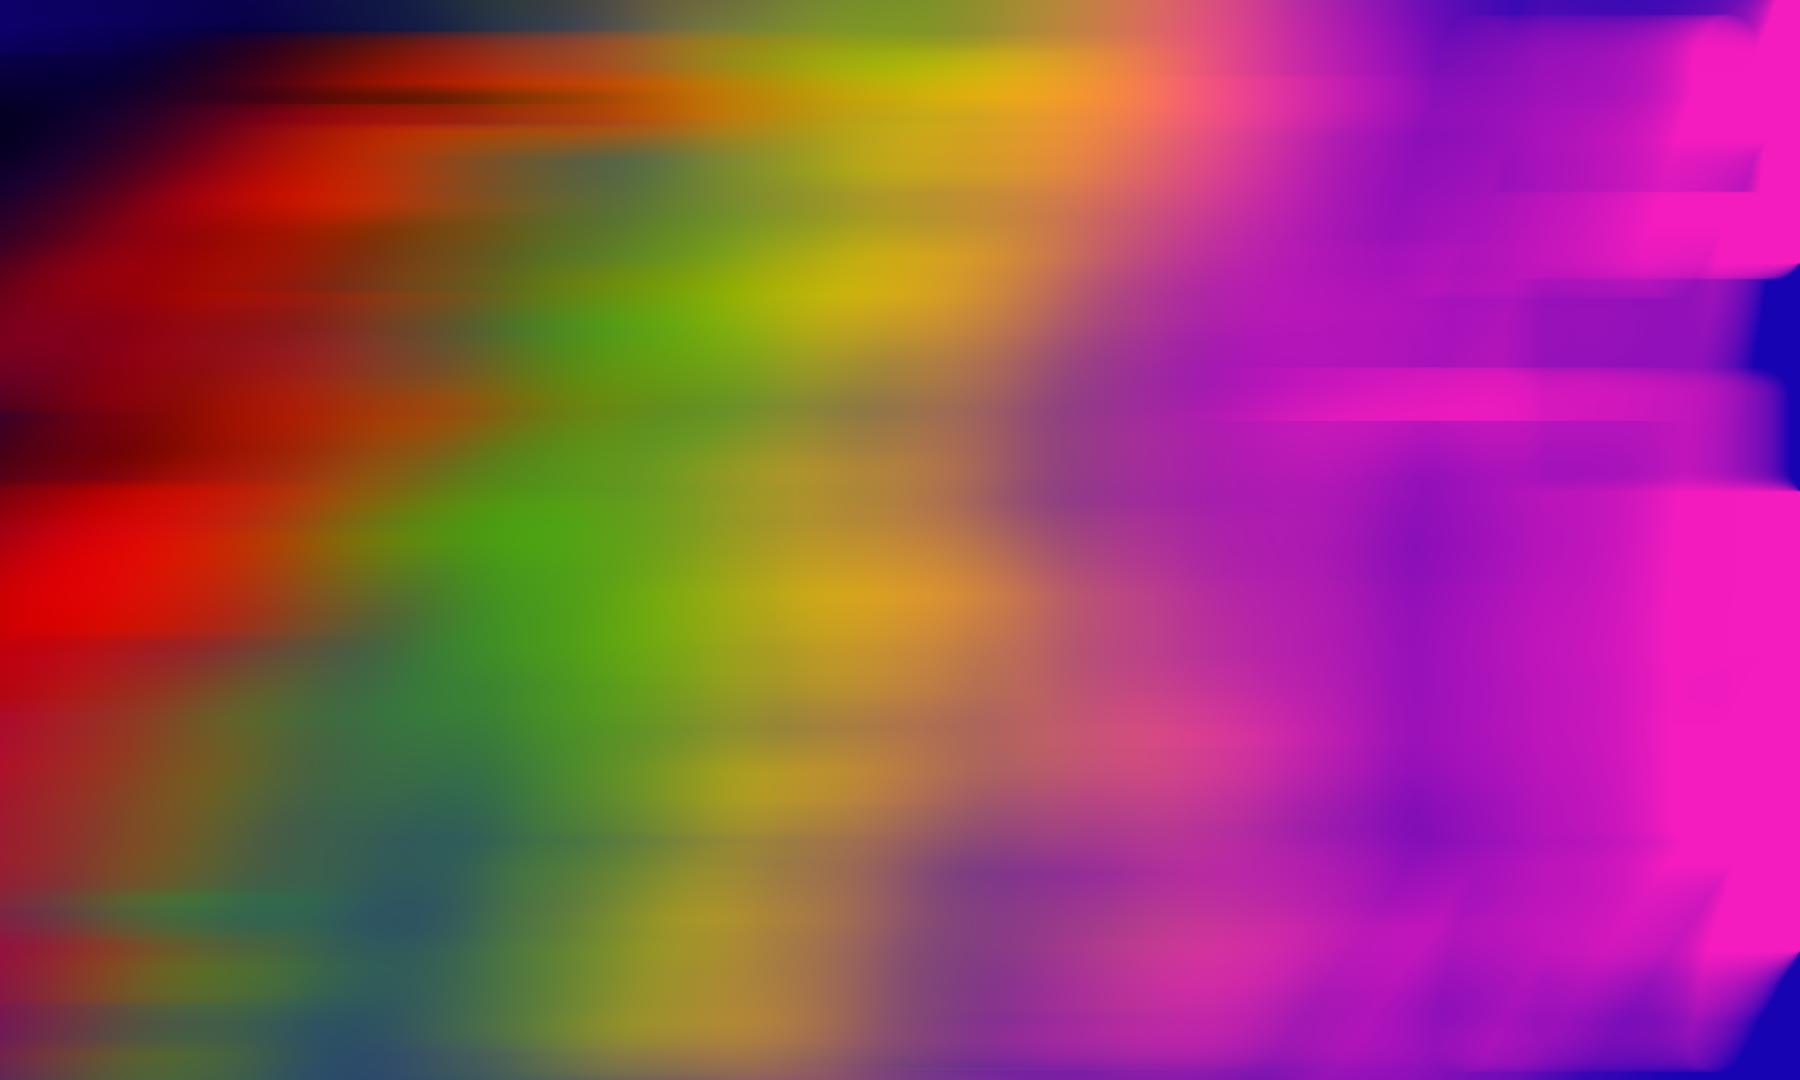 Image ID: 188464